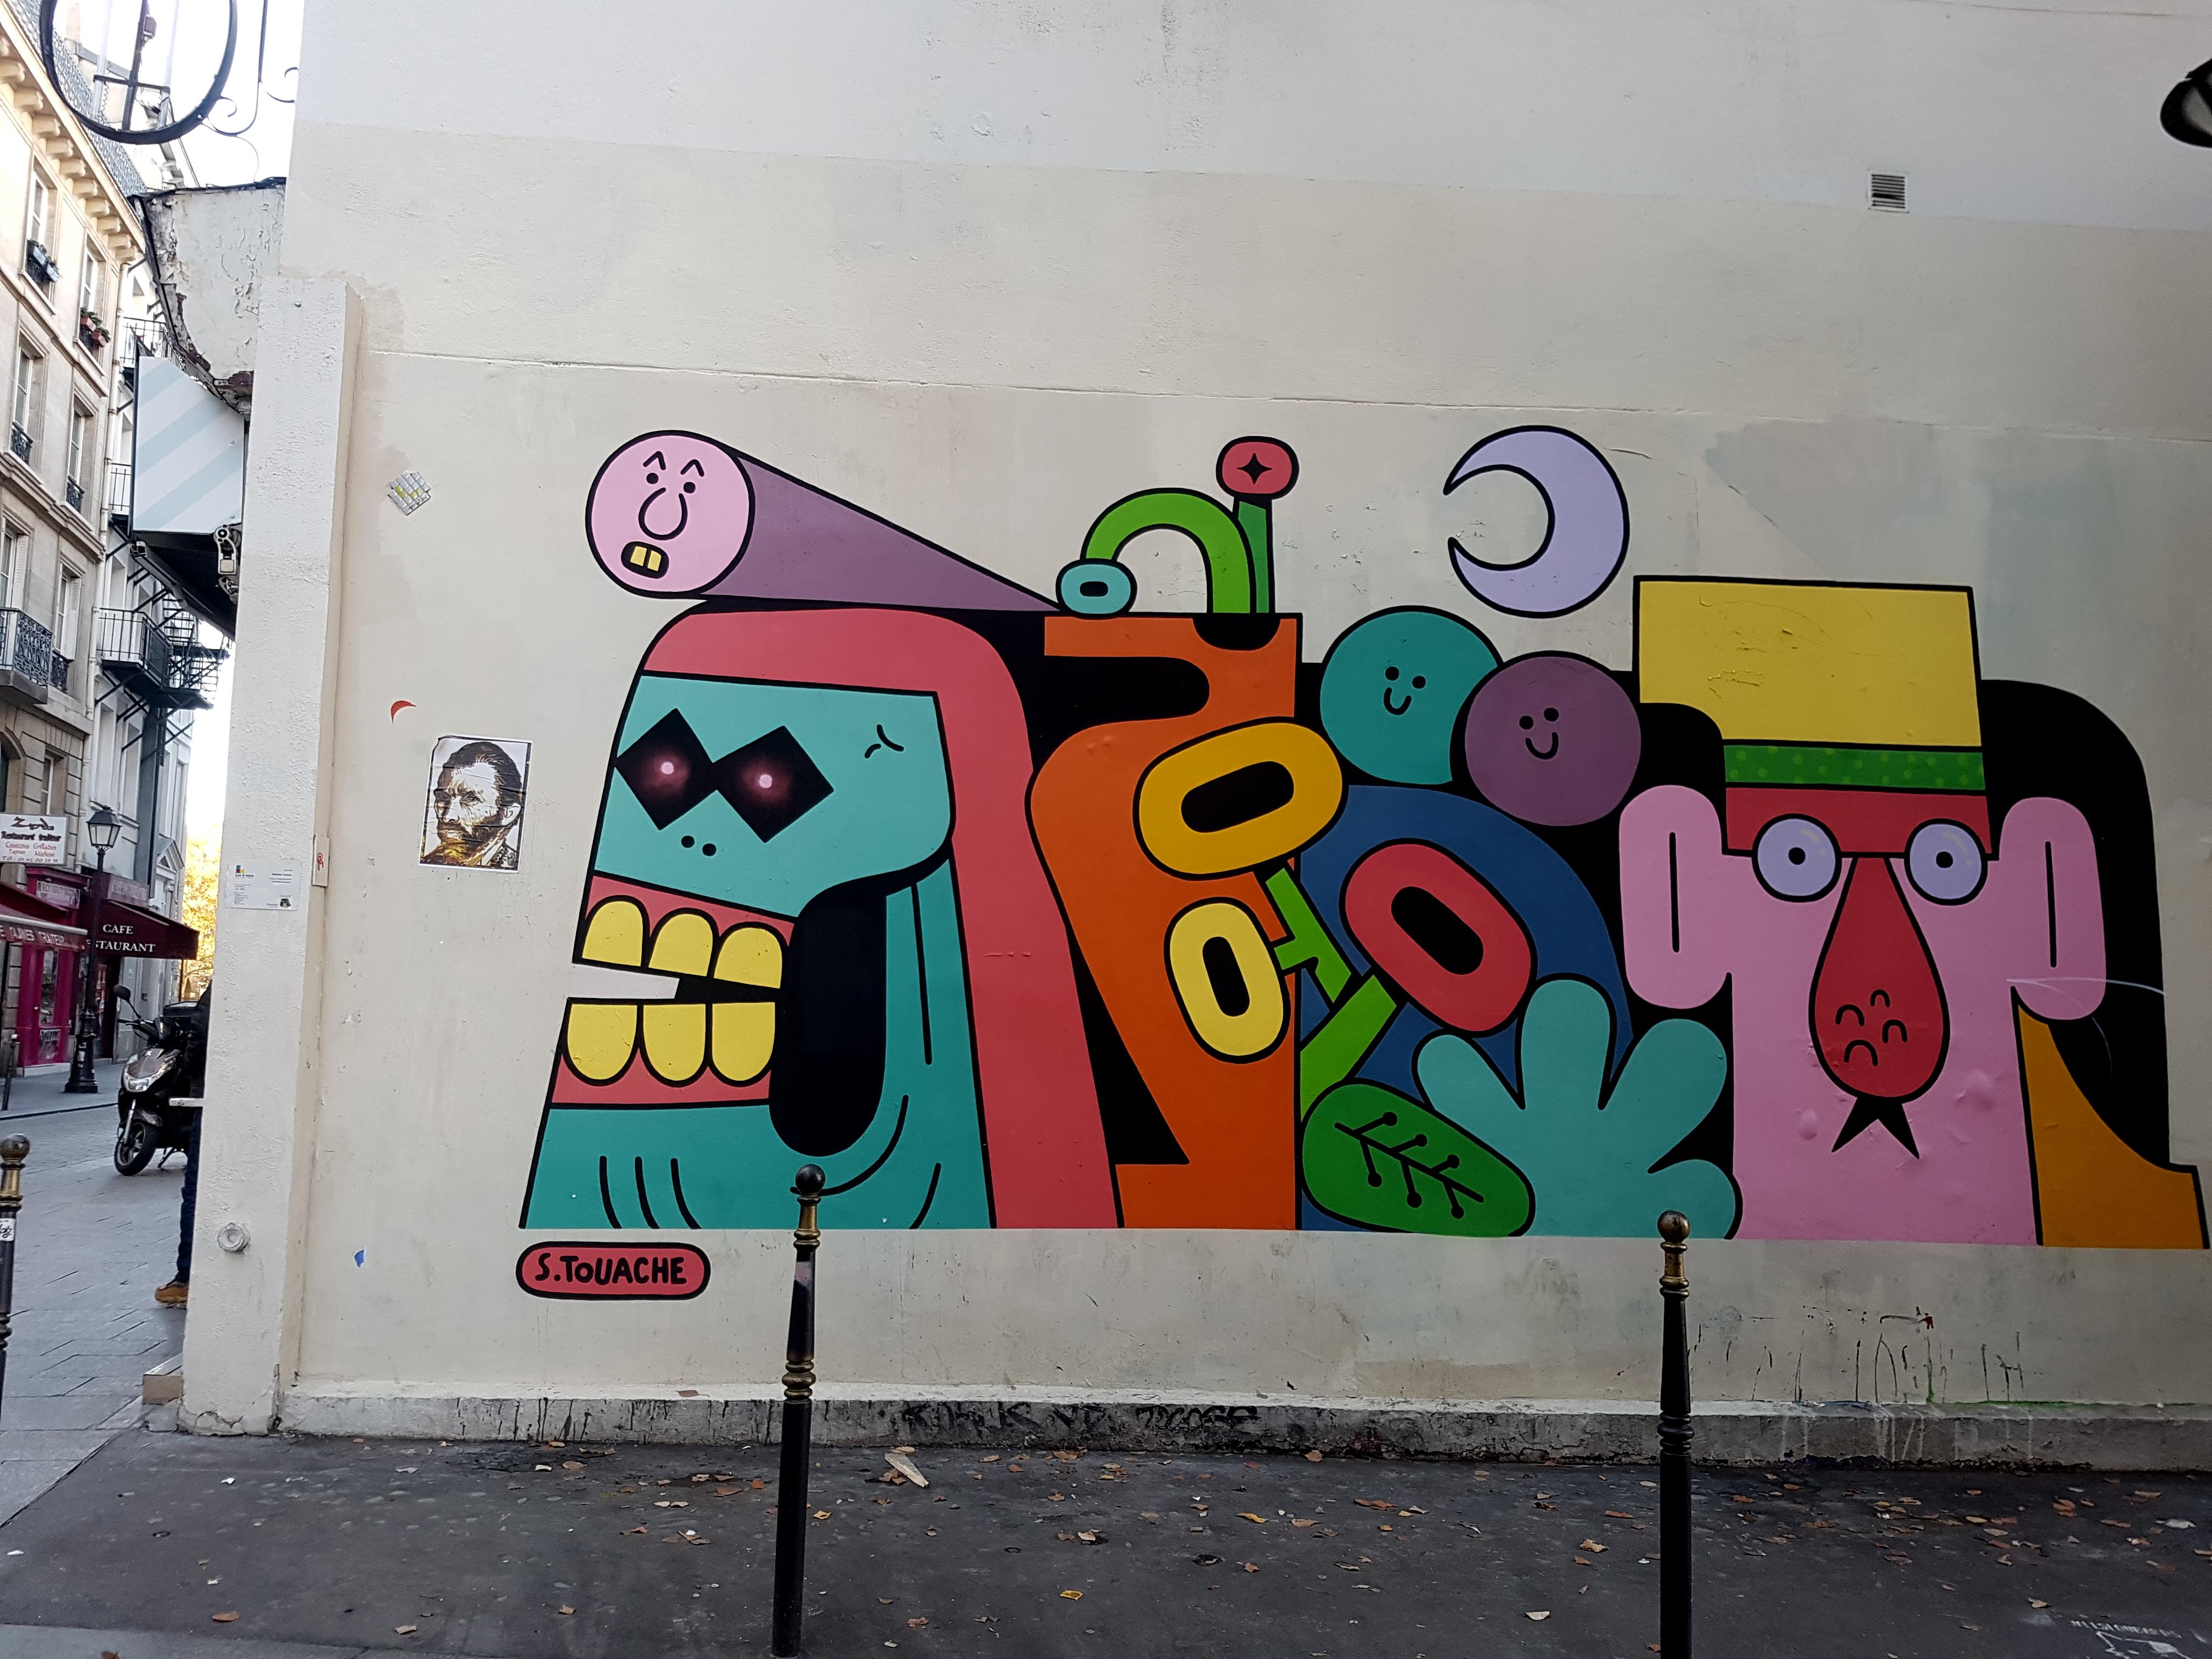 sebastien touache street art paris 10